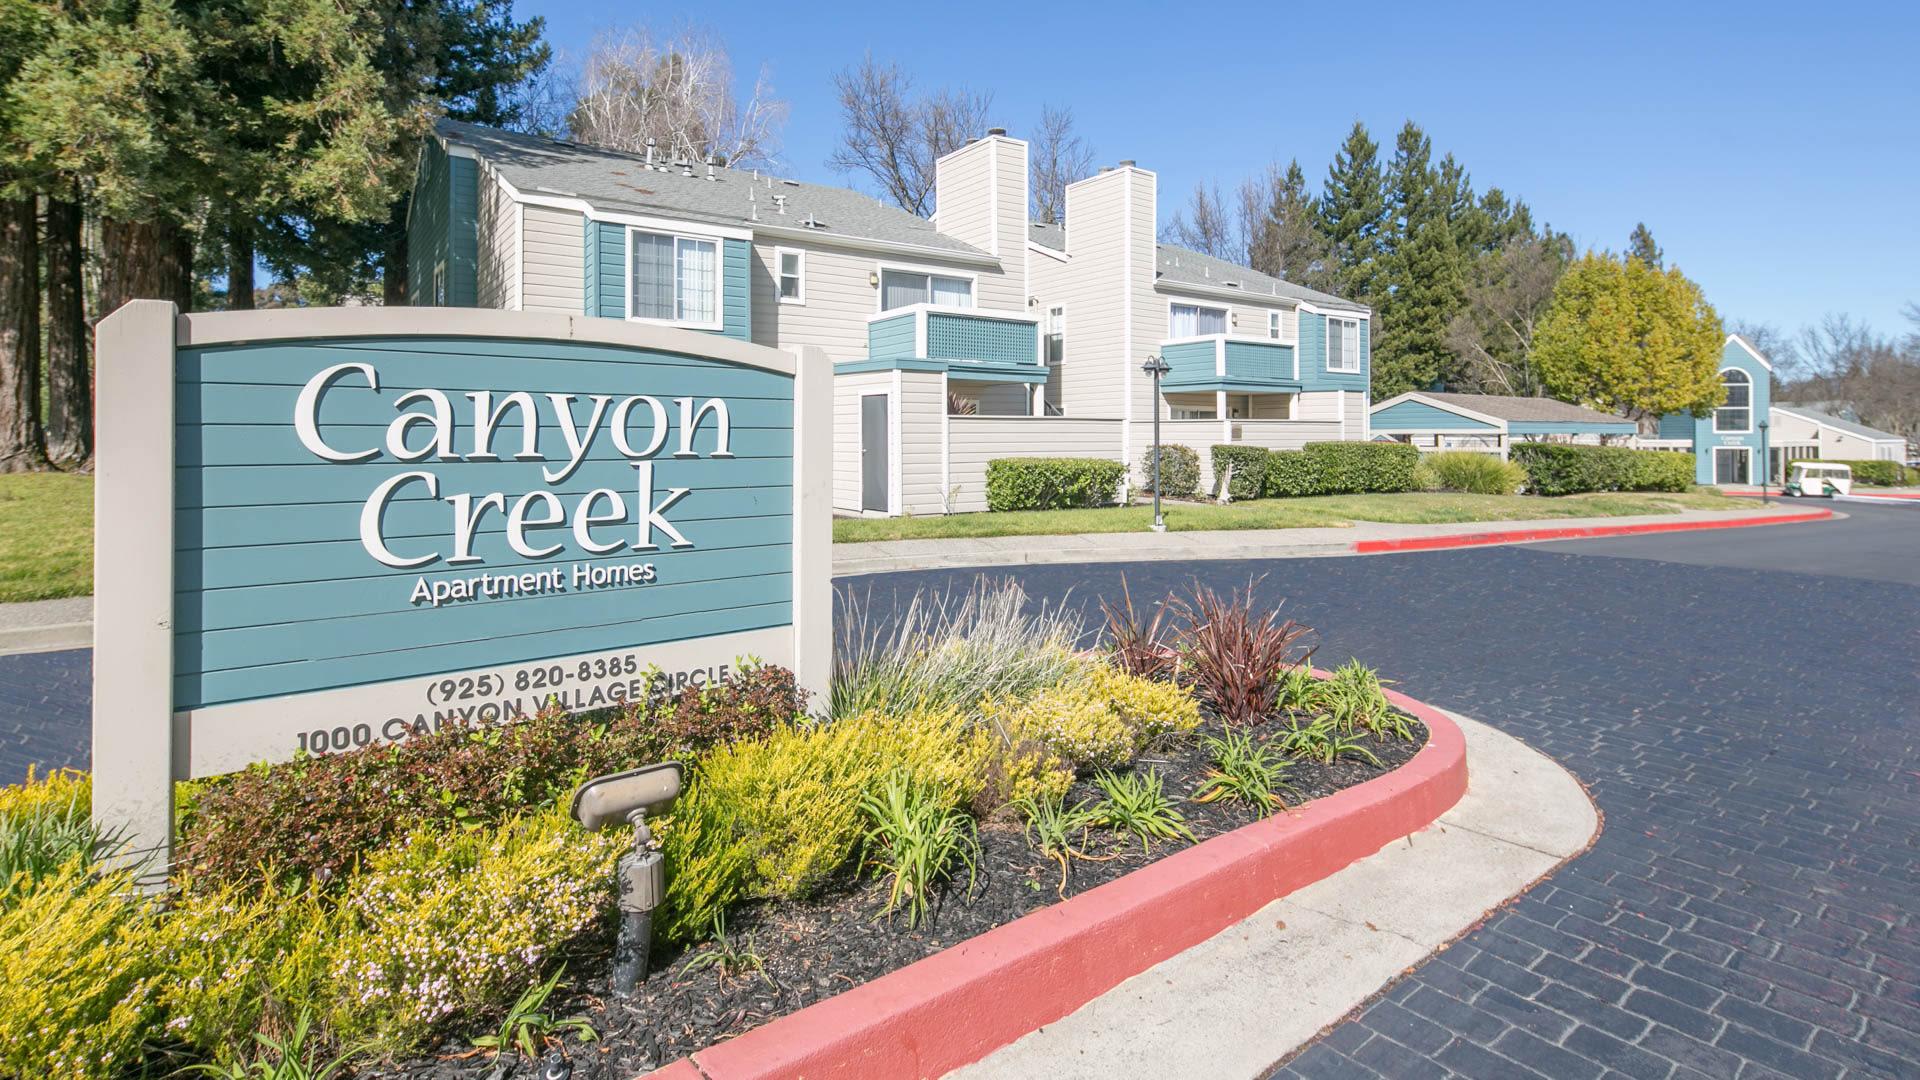 Canyon Creek Apartments - Exterior